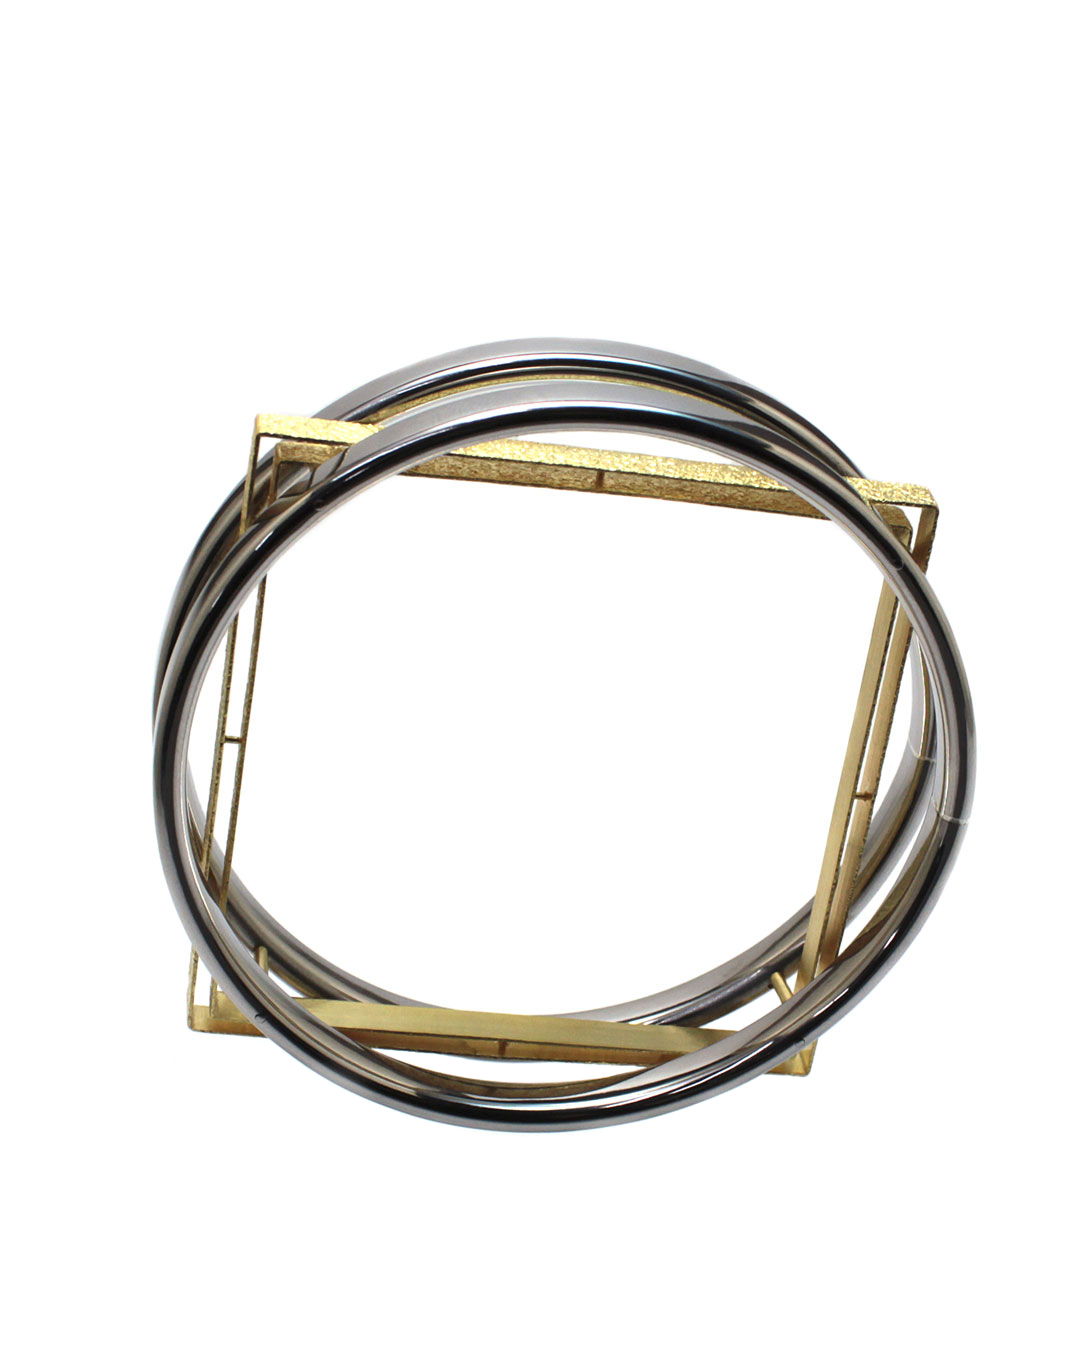 Okinari Kurokawa, untitled, 2014, bracelet; 20ct gold, stainless steel, 83 x 83 x 20 mm